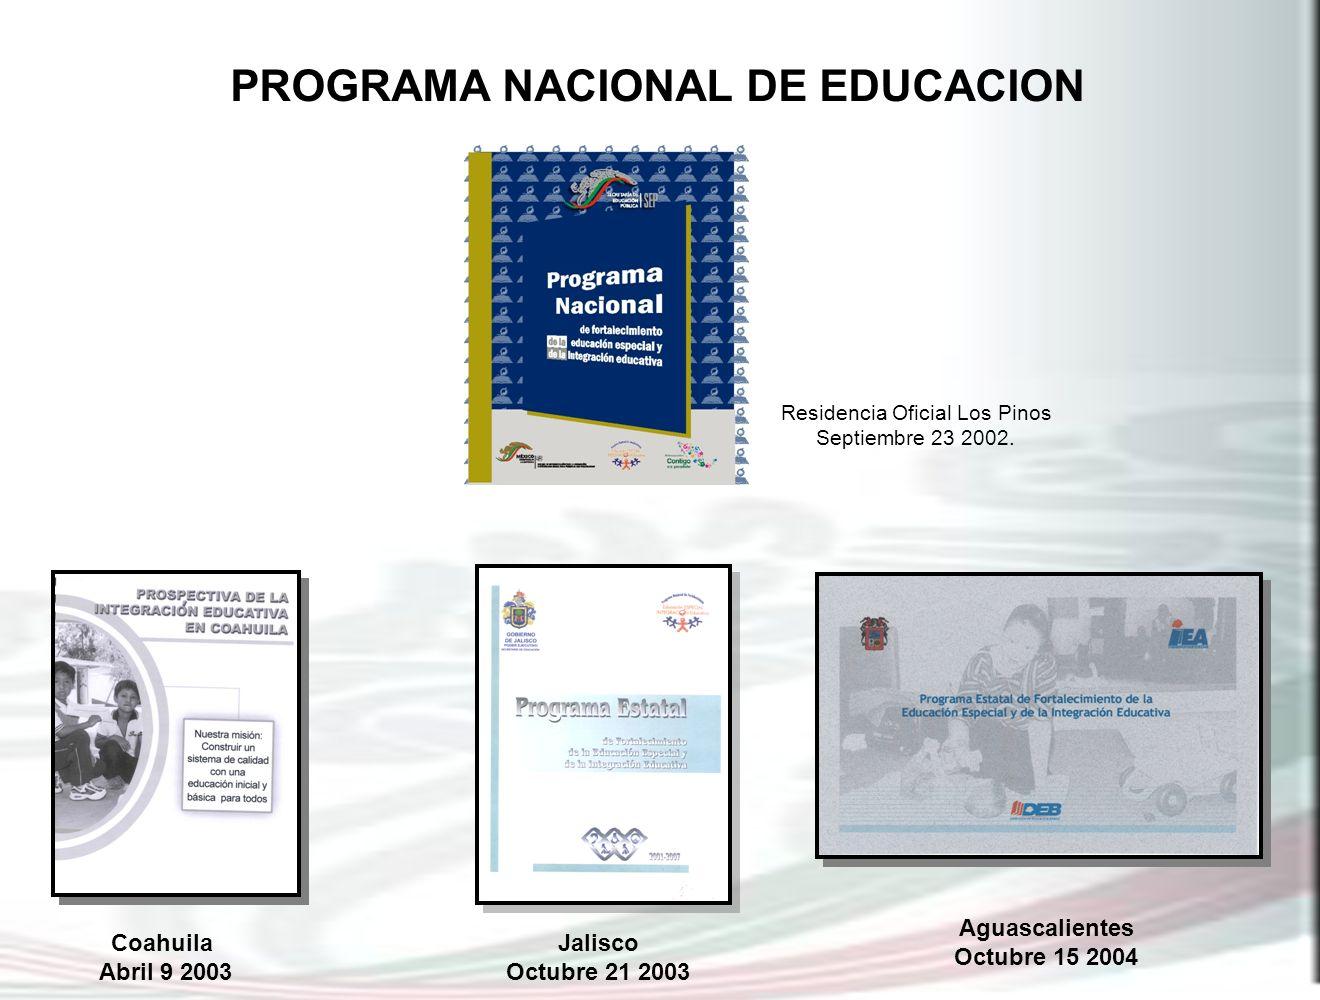 PROGRAMA NACIONAL DE EDUCACION Residencia Oficial Los Pinos Septiembre 23 2002. Coahuila Abril 9 2003 Aguascalientes Octubre 15 2004 Jalisco Octubre 2